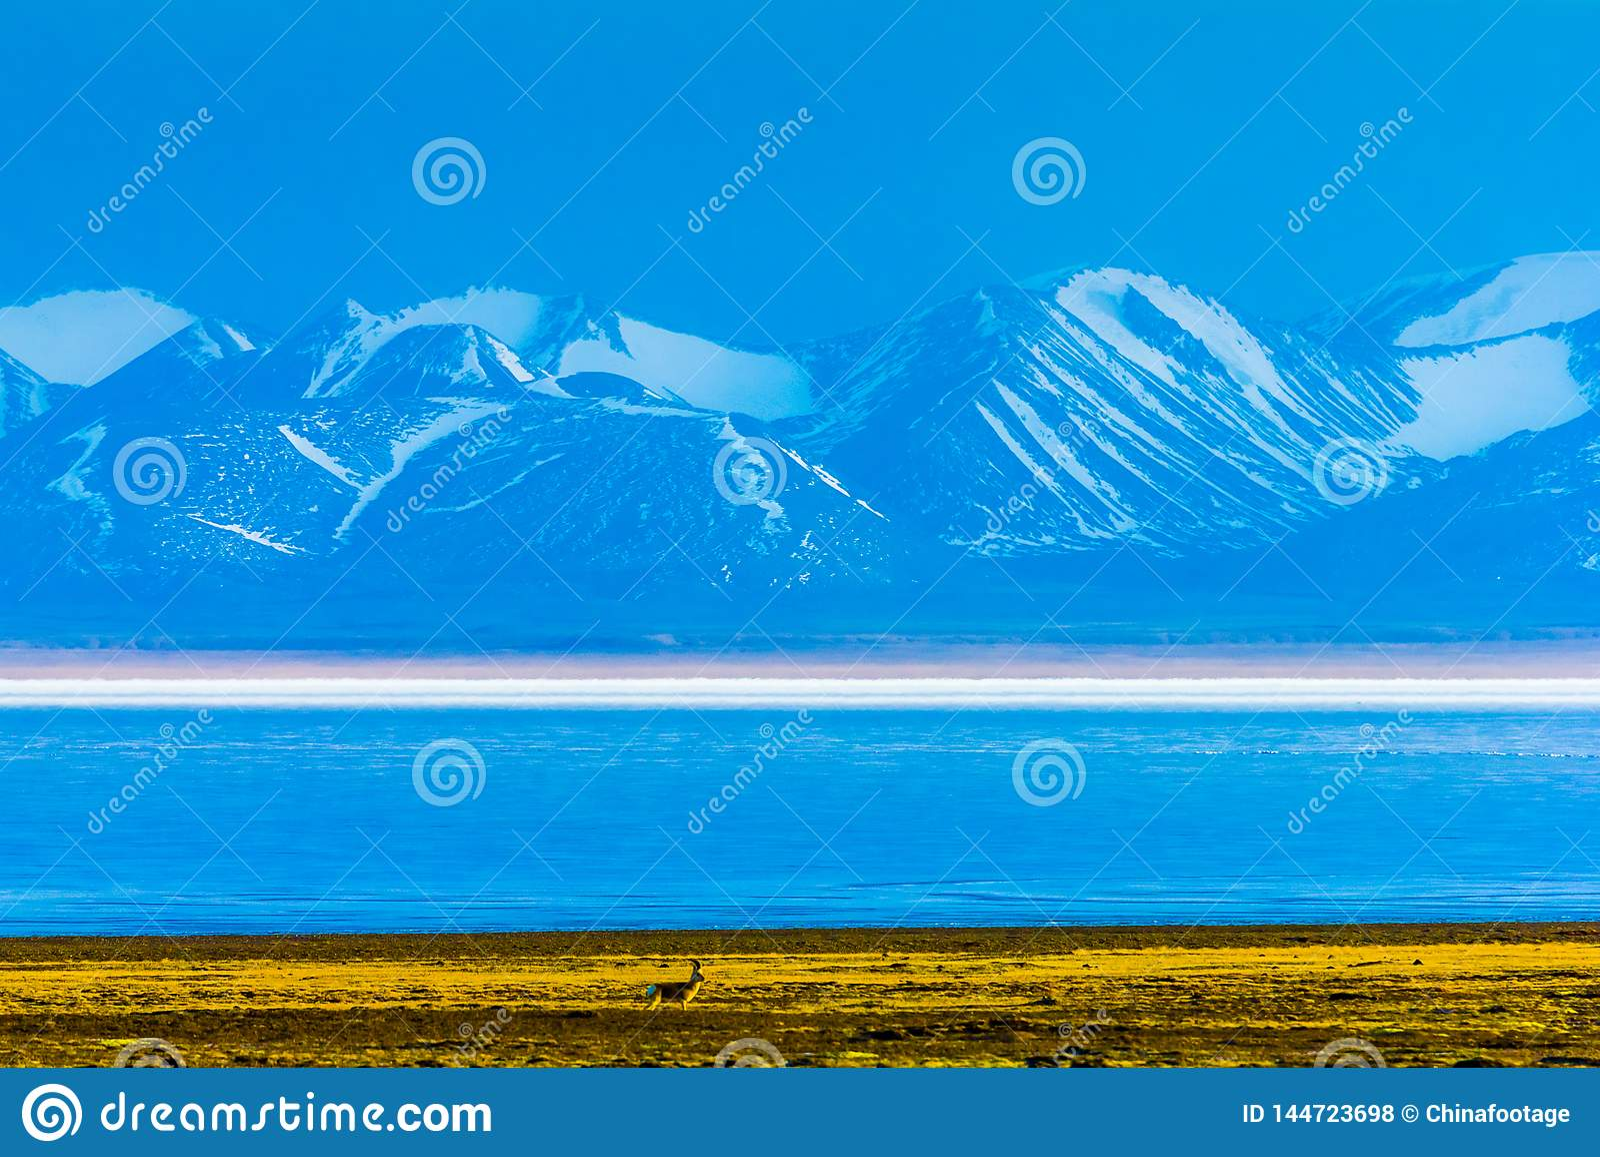 Hala湖和雪加盖了祁连山山脉,青海西藏Platea,中国